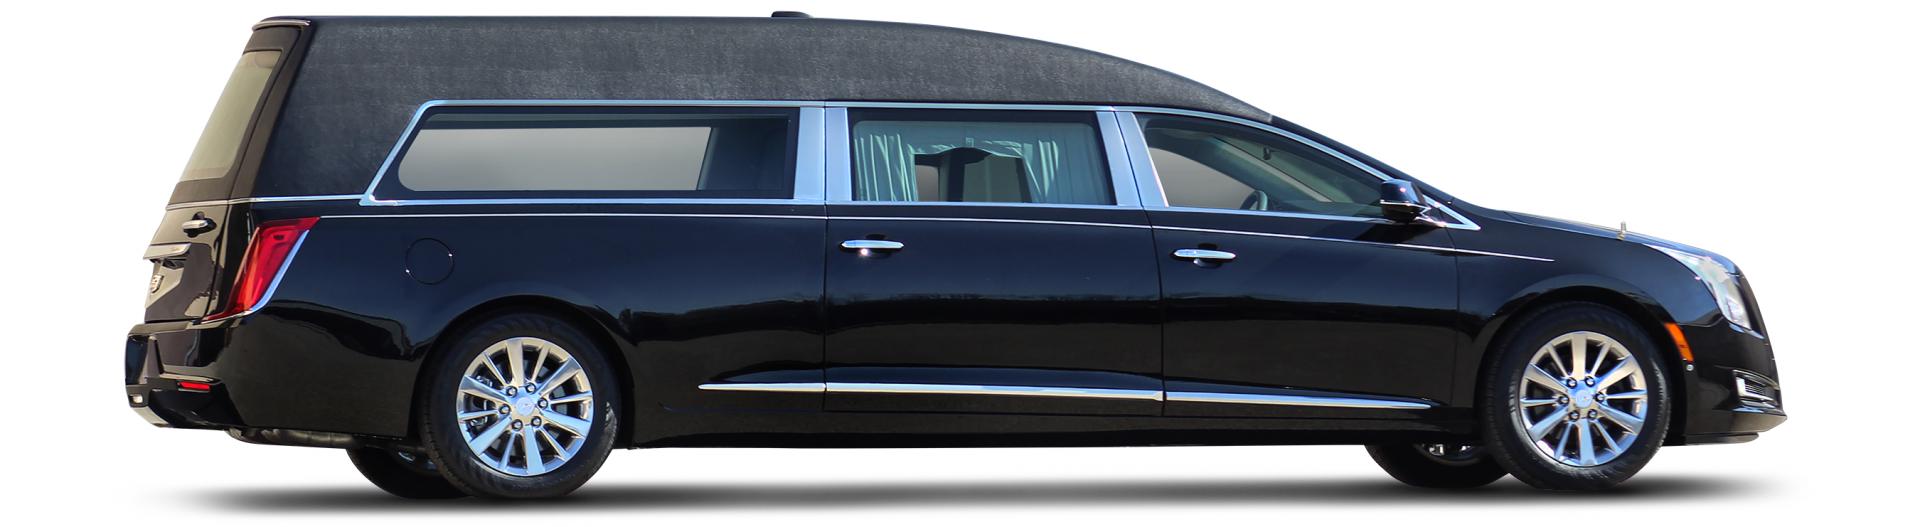 2019 Cadillac XTS Kensington